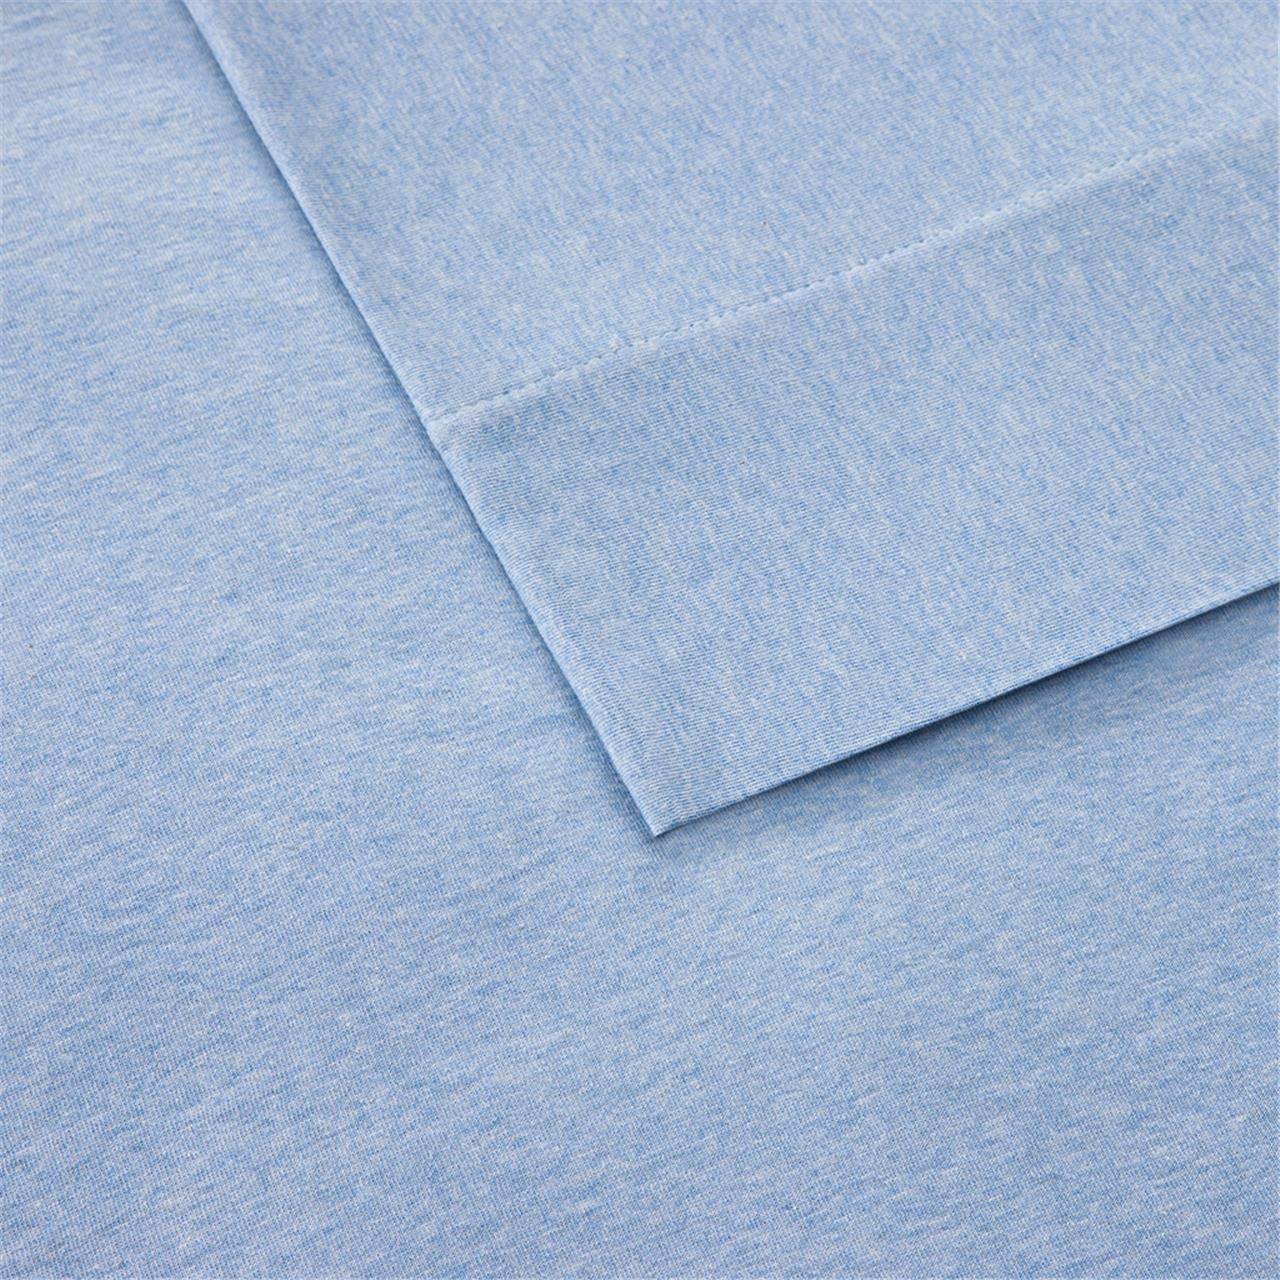 Ink+Ivy Cotton Jersey Knit All Season Heathered Sheet Set Natural Twin